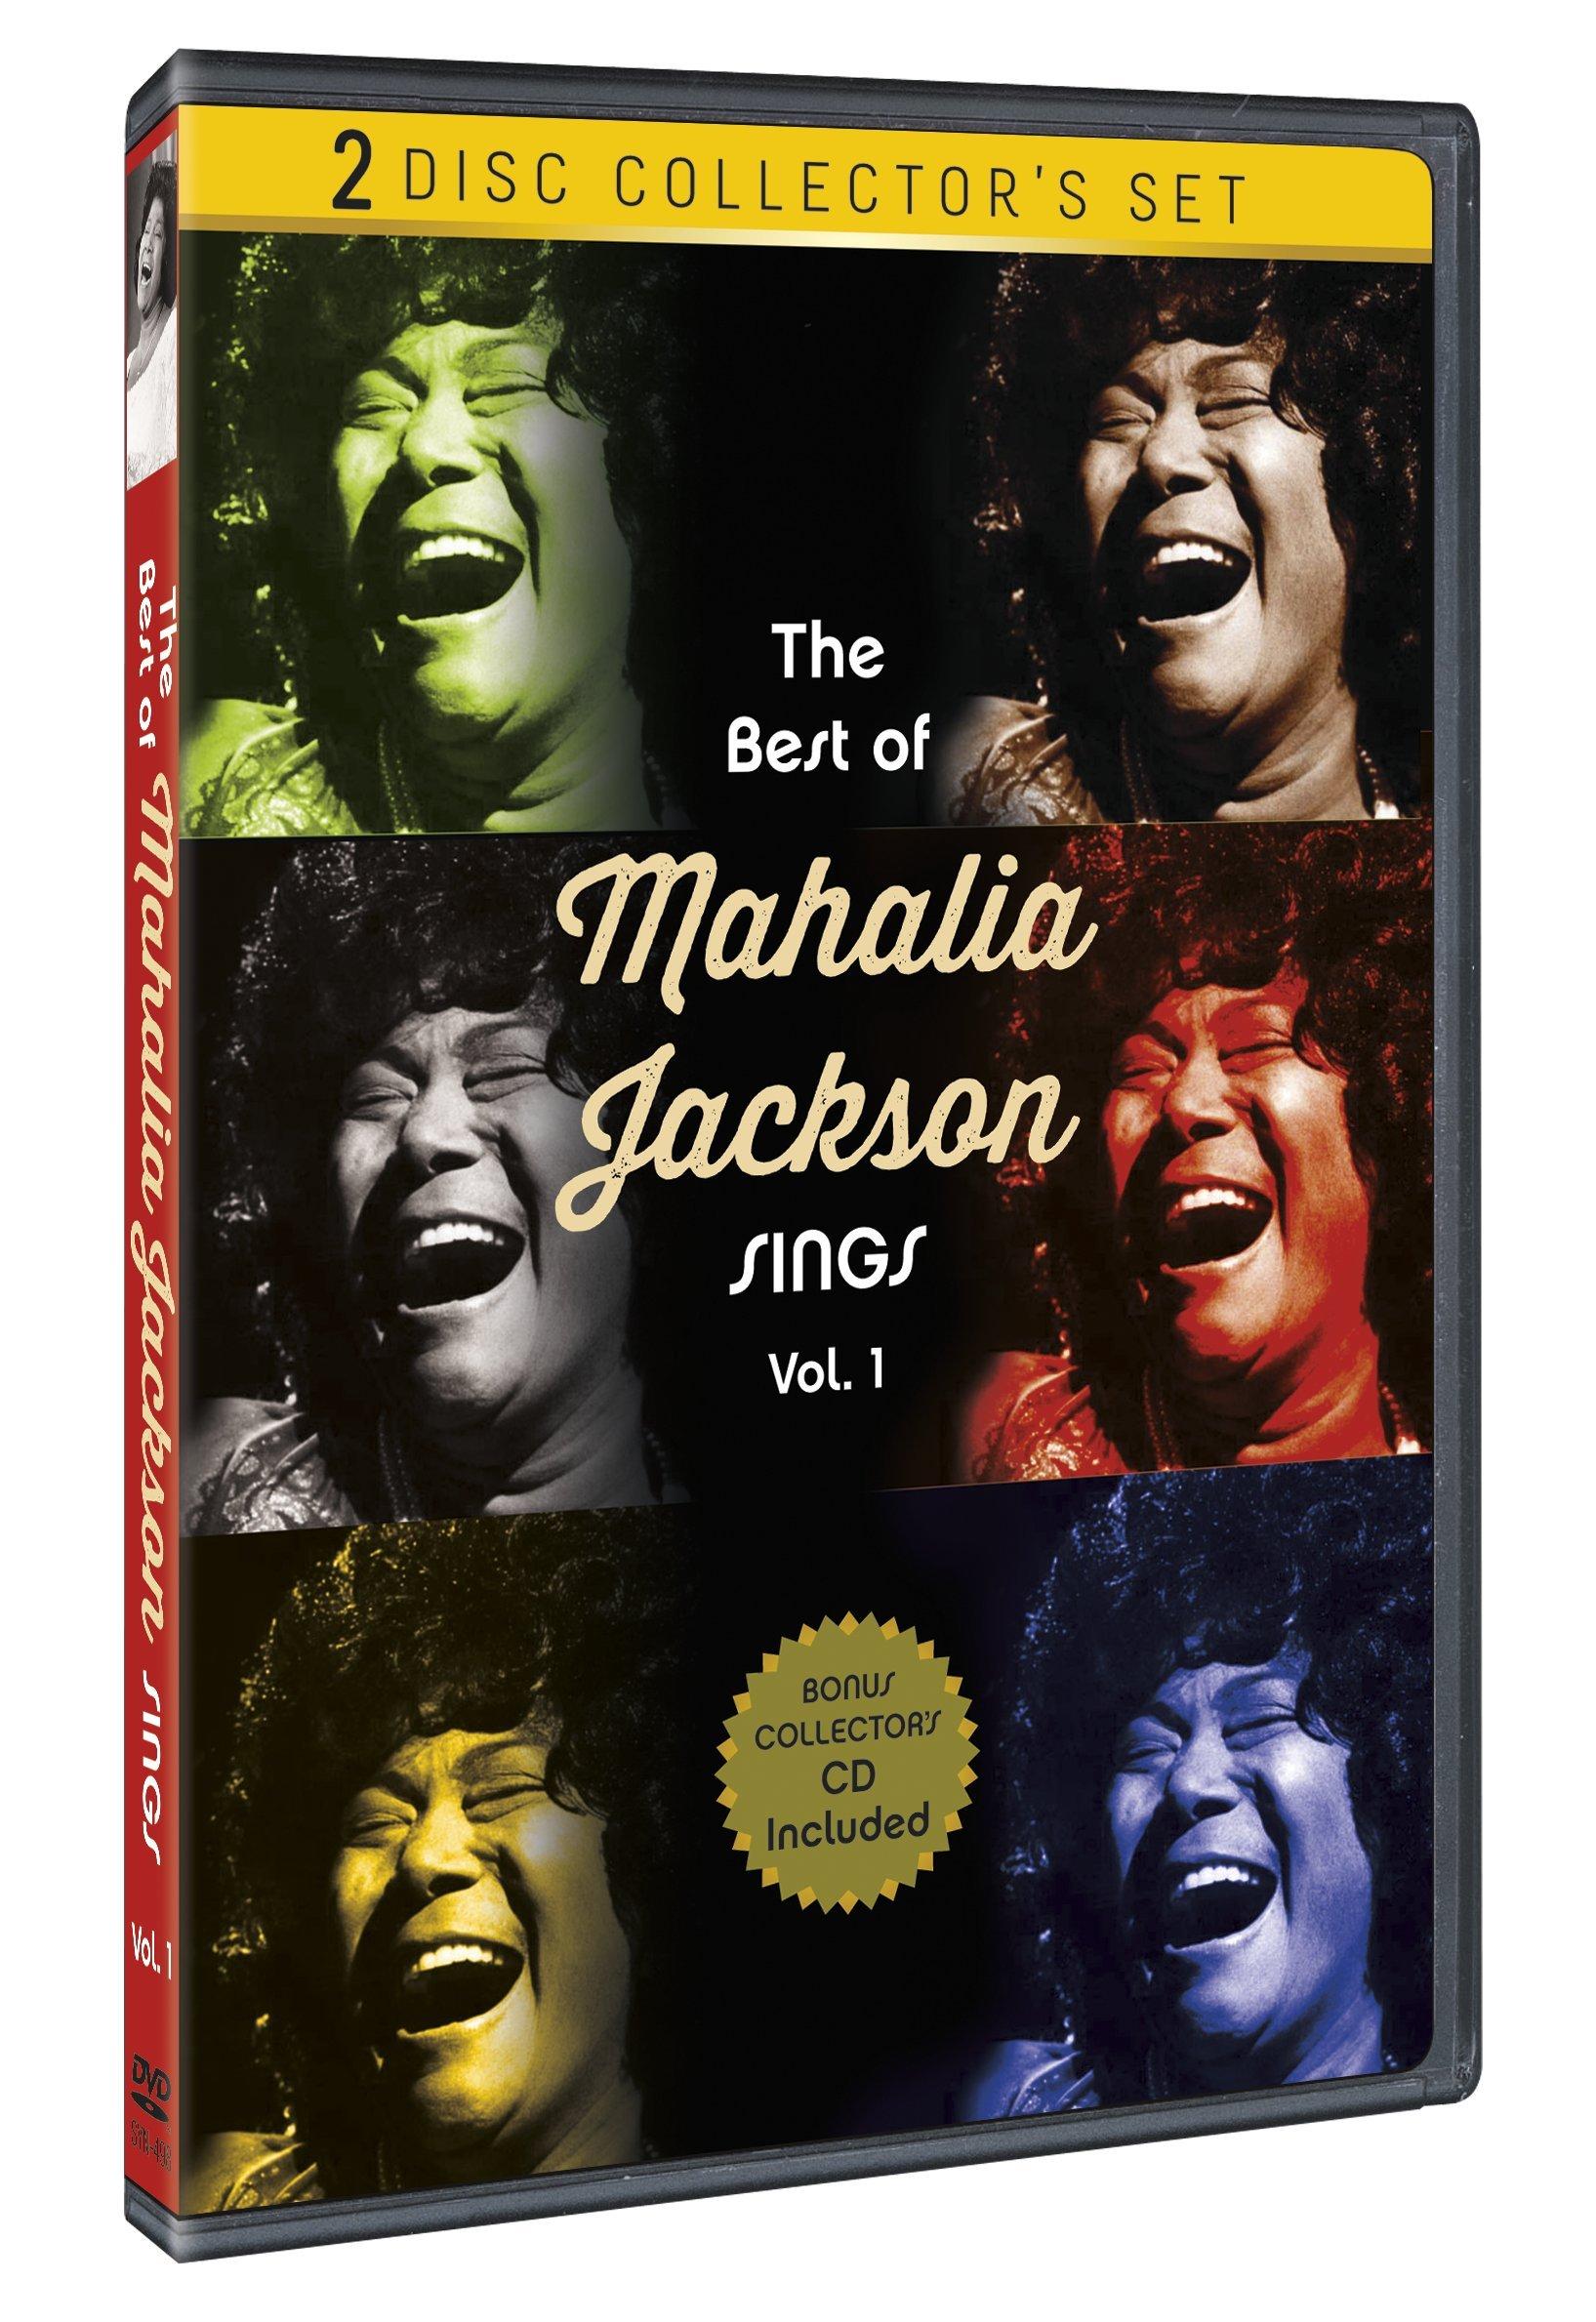 Michael Burns - The Best of Mahalia Jackson Sings: Volume 1 (With CD, Black & White)